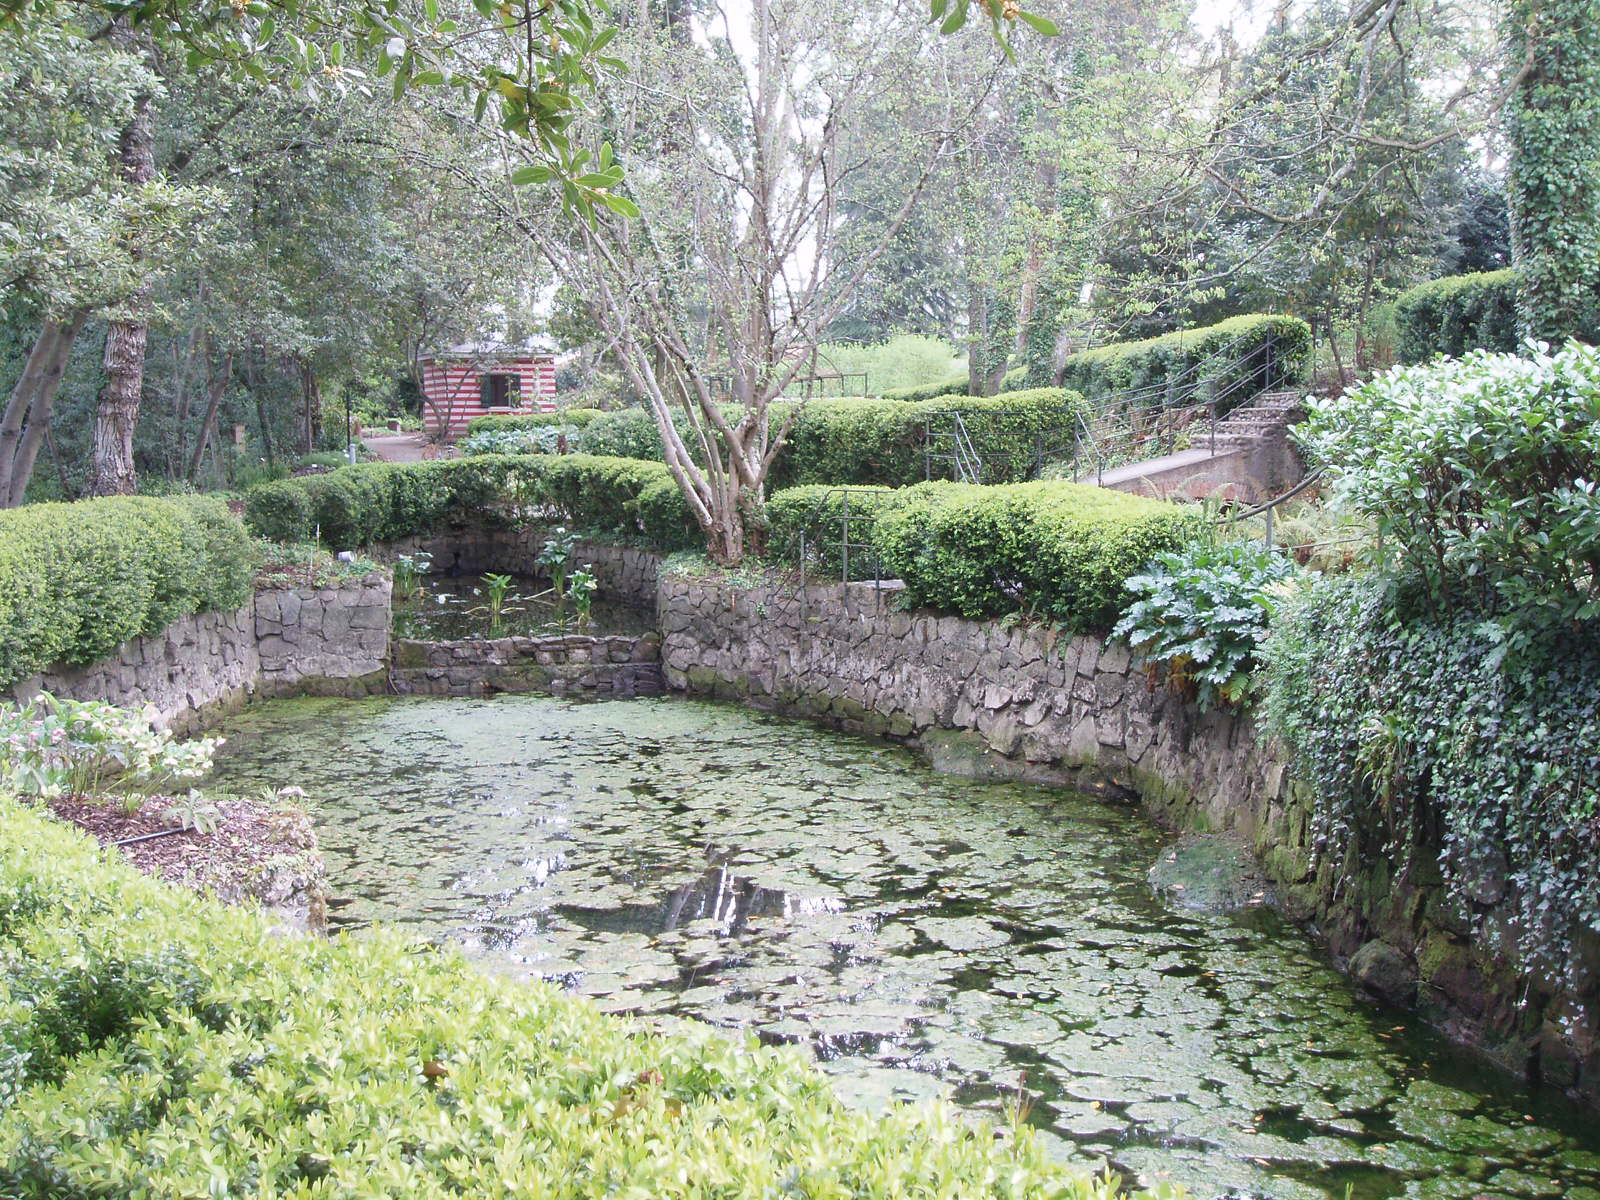 Metido en jardines jard n bot nico atl ntico de gij n for El jardin botanico gijon